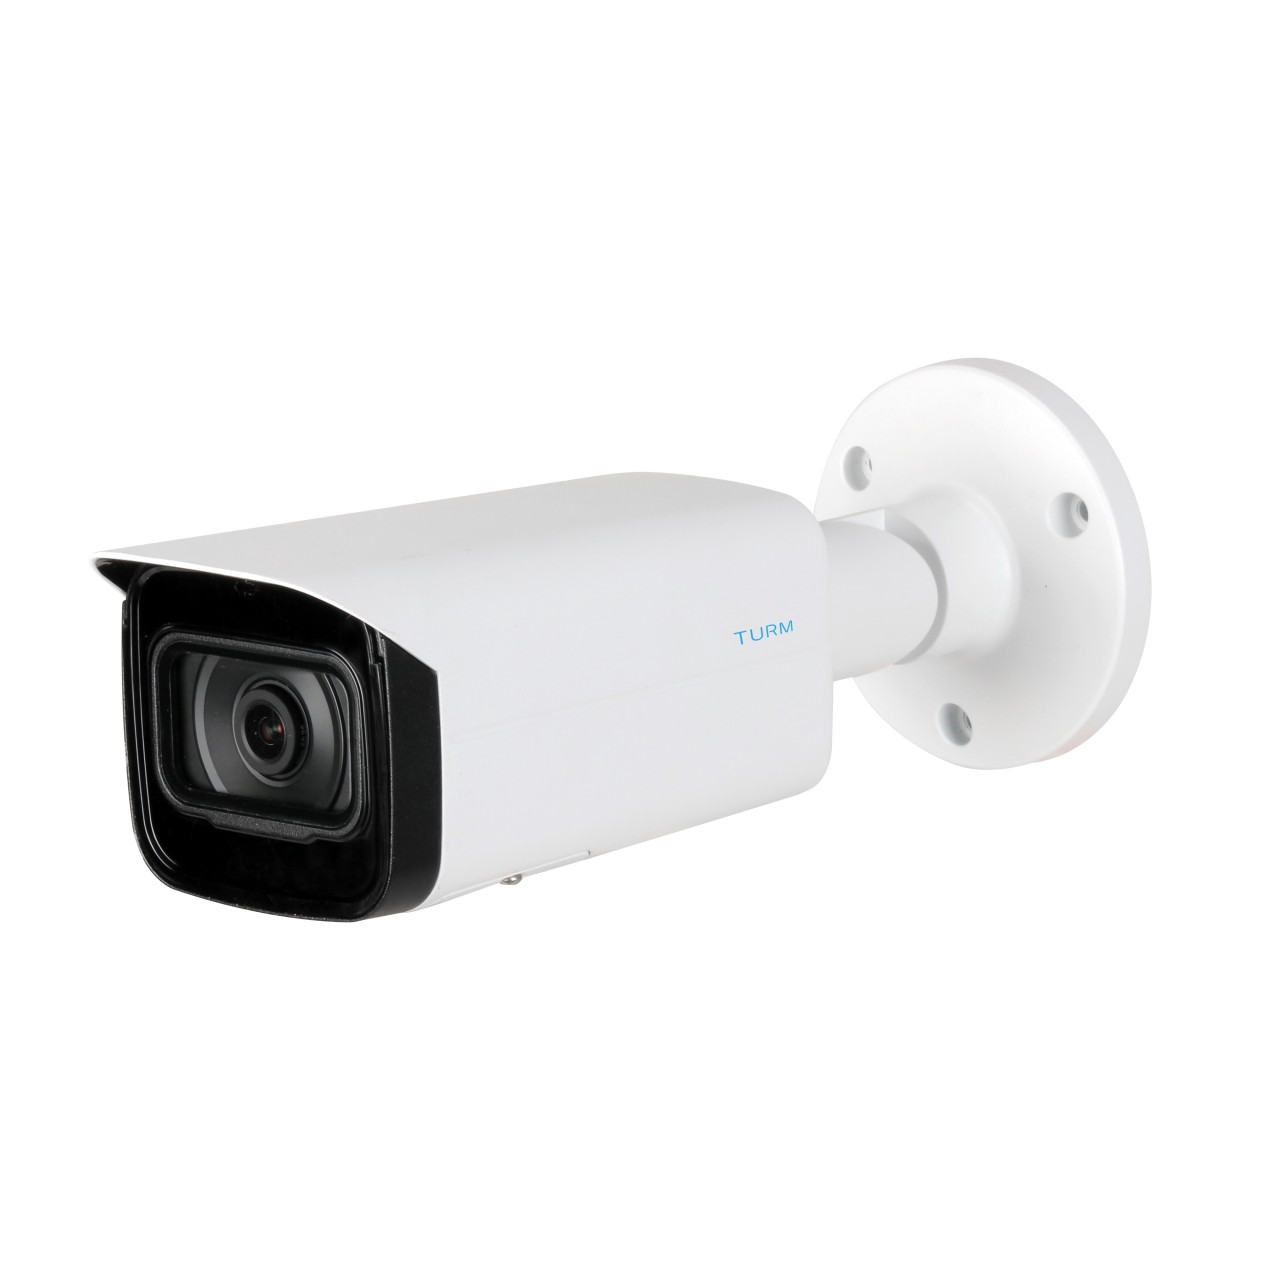 TURM Professional 4 MP Bullet Kamera, 80m Nachtsicht mit Starlight, 3.6mm, PoE und WDR